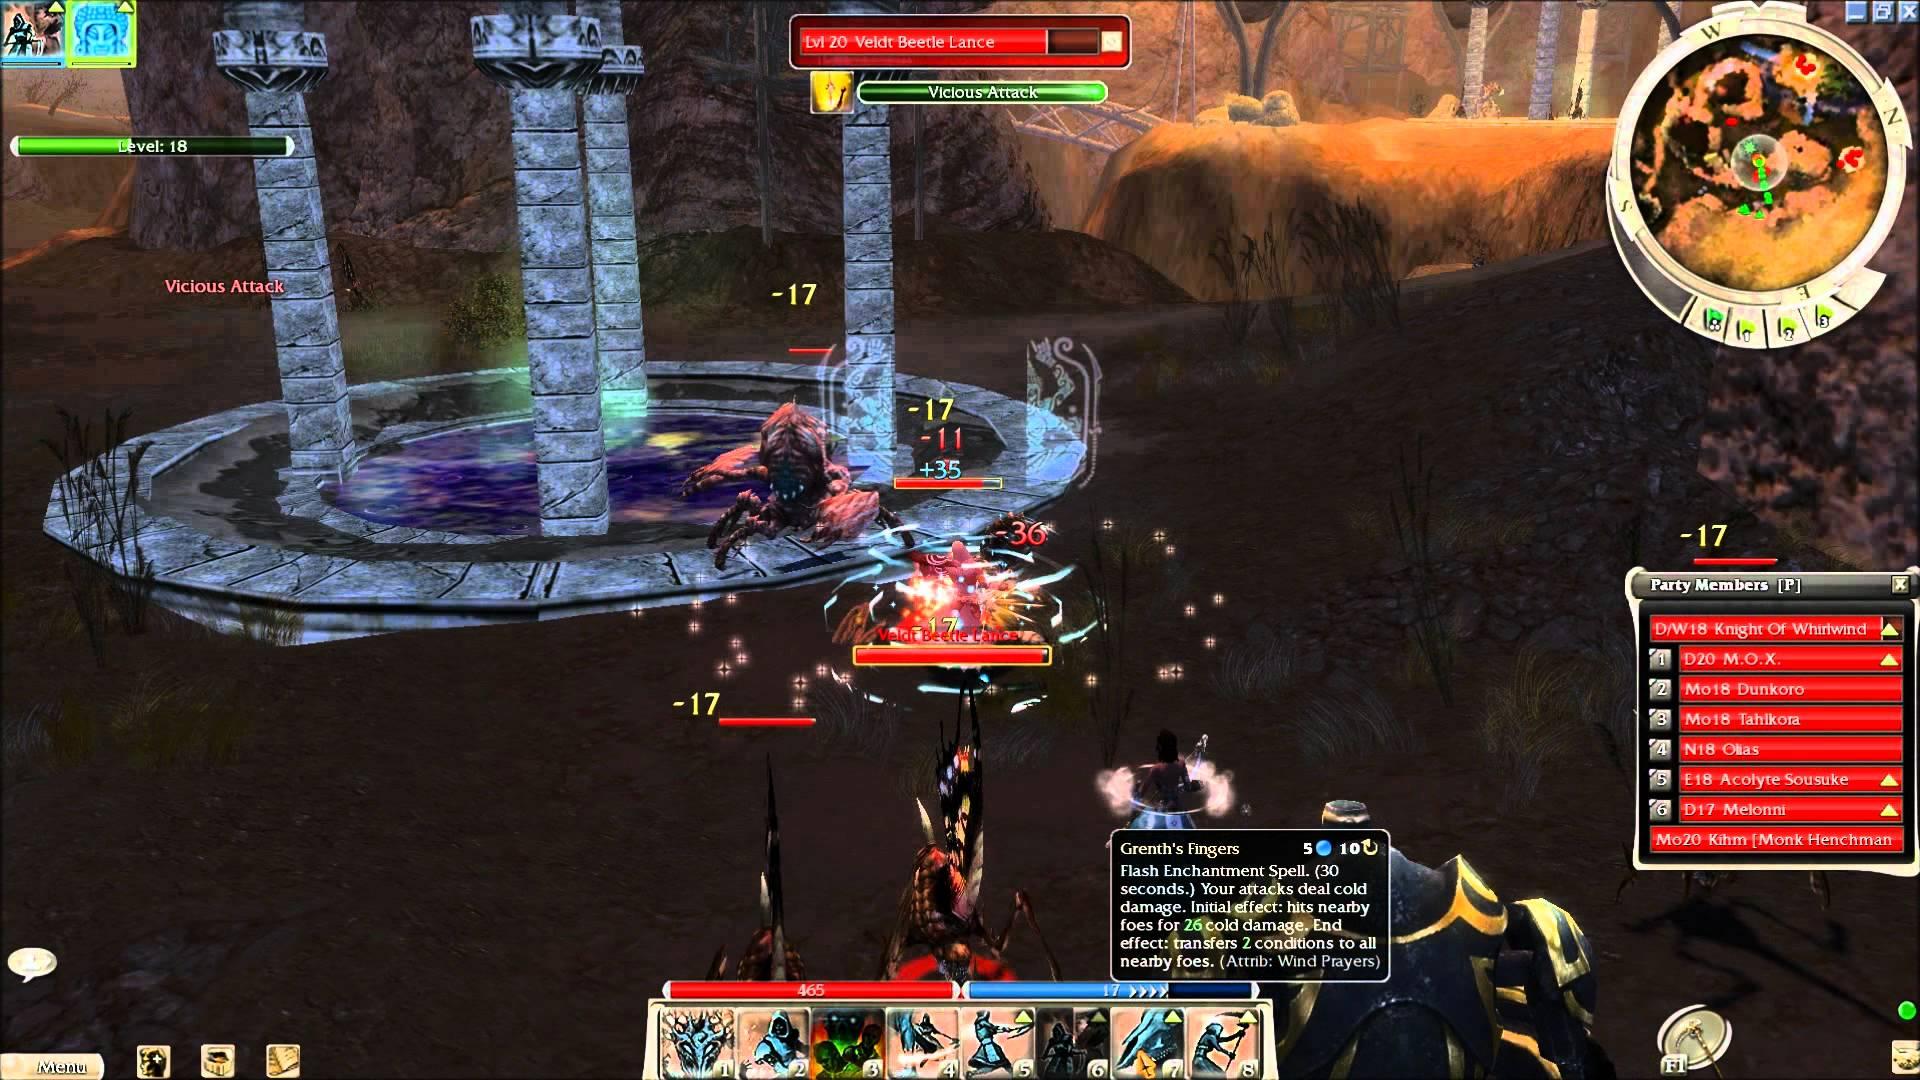 Guild Wars Nightfall HD wallpapers, Desktop wallpaper - most viewed